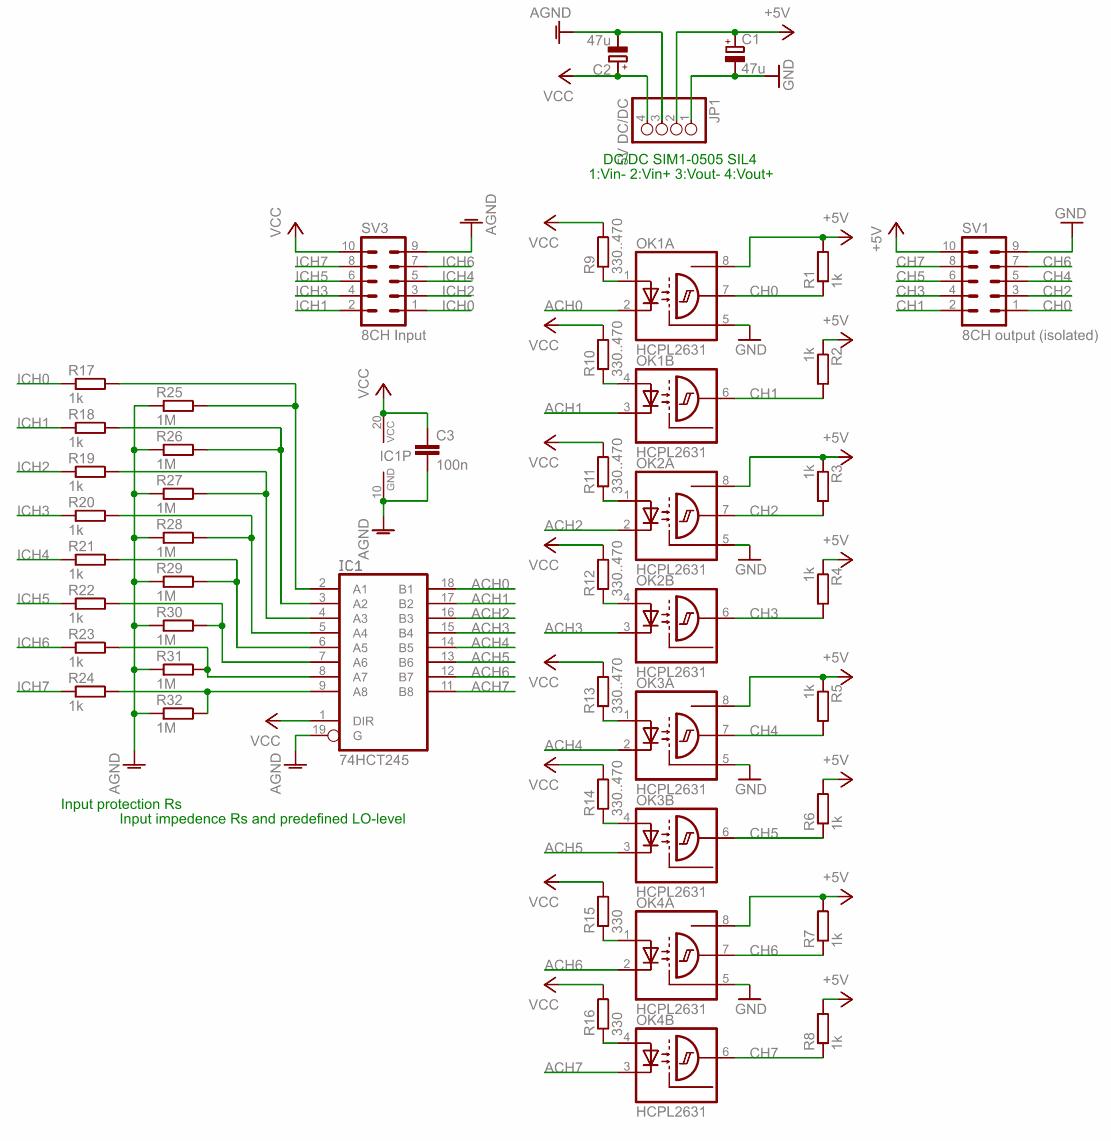 logic-analyzer-galvanic-isolation-circuit-schematic